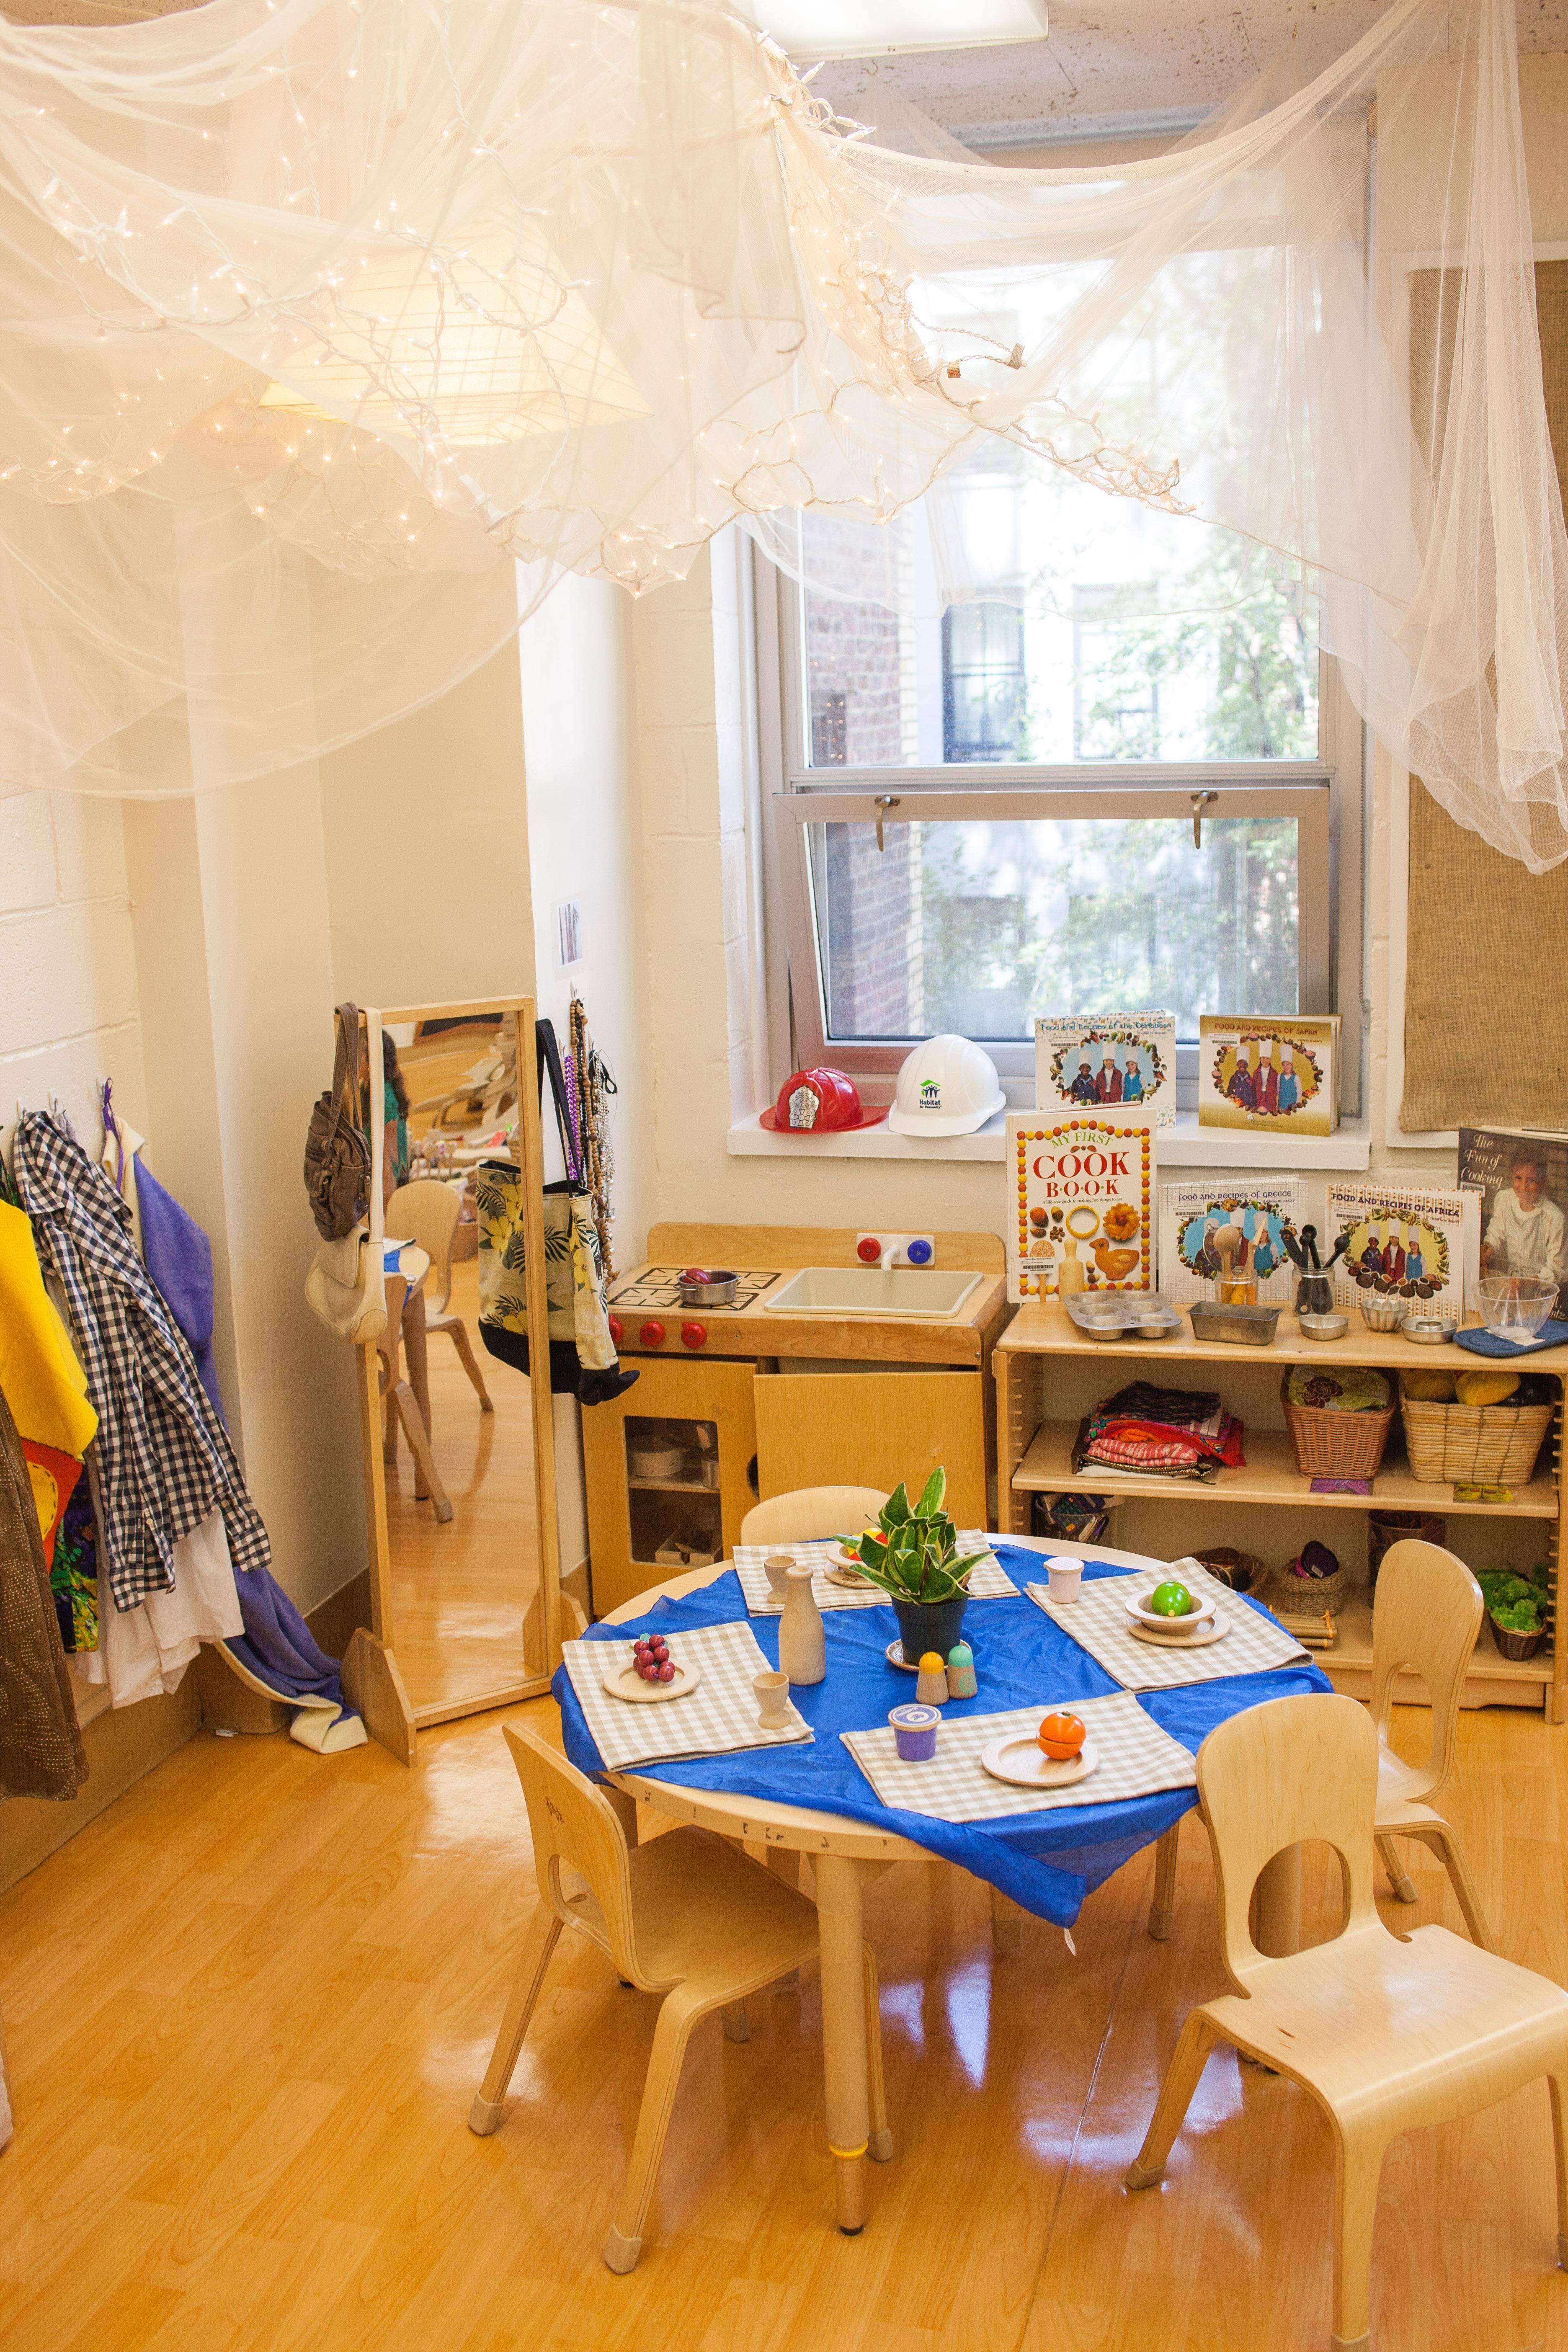 Interior Of A Prekindergarten Clroom At The Horace Mann School Nursery Division On Upper East Side New York Sept 3 Petr Svab Epoch Times